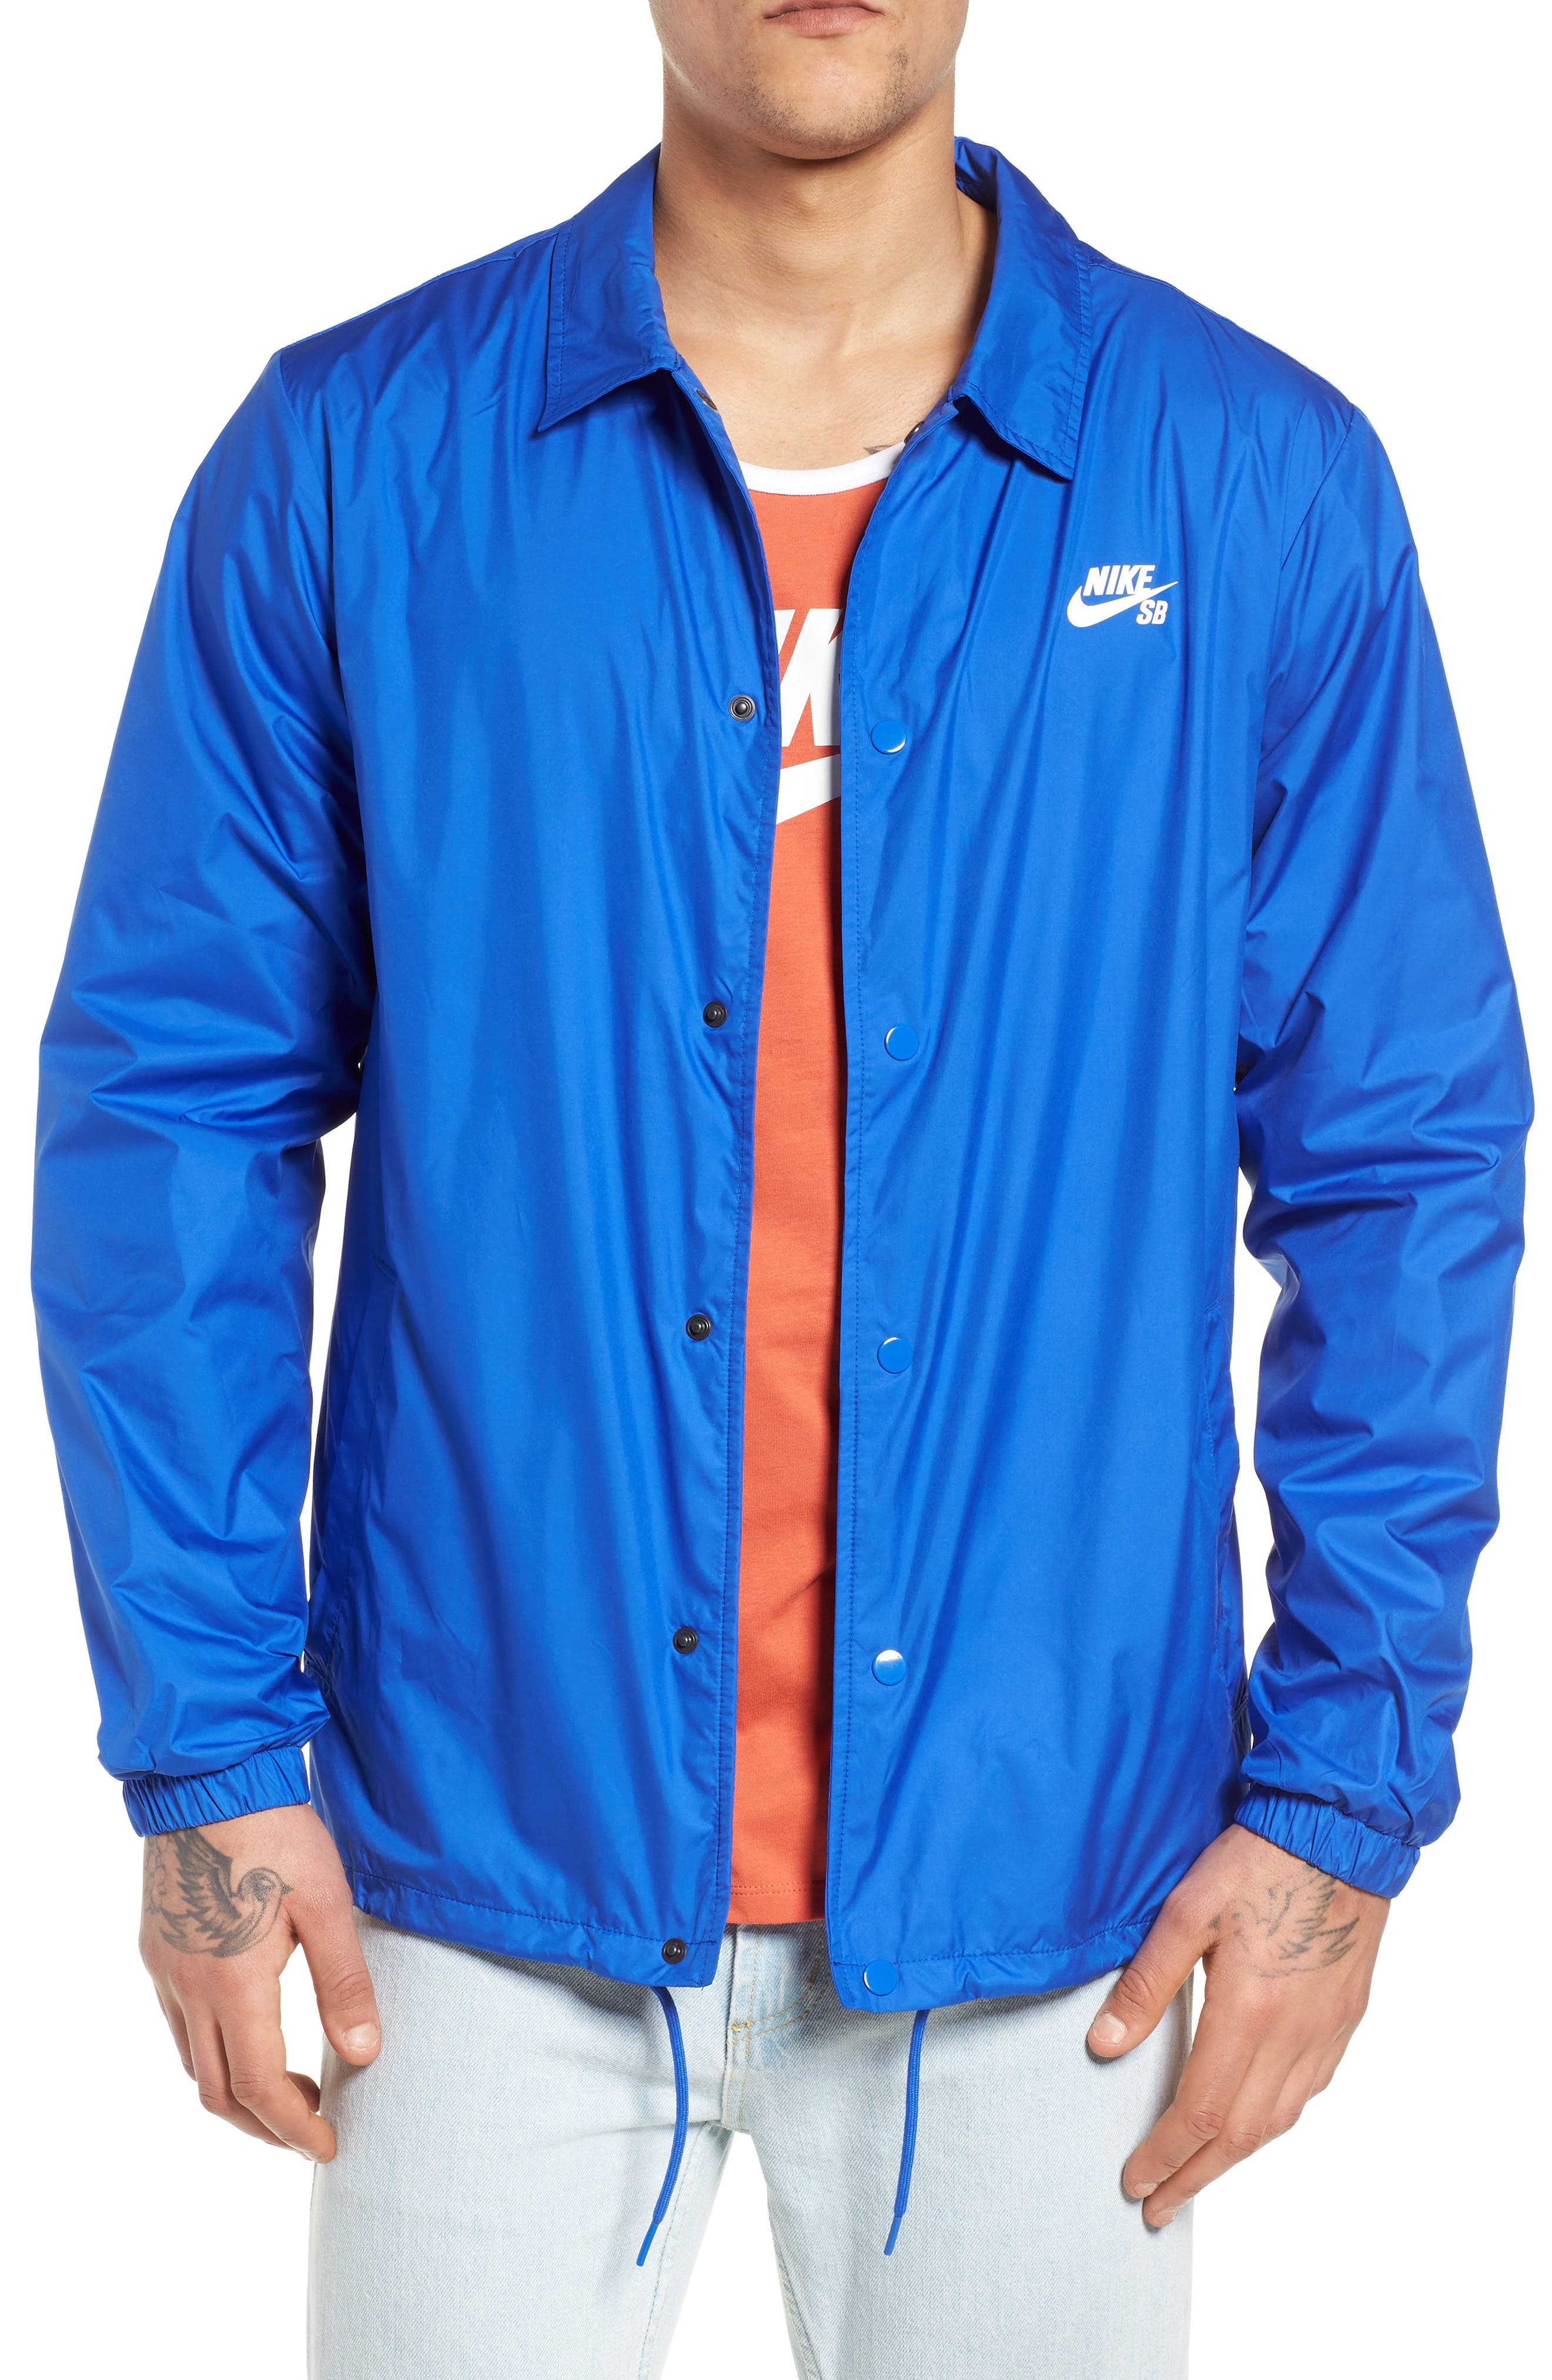 SB Shield Coach's Jacket,                         Main,                         color, HYPER ROYAL/ WHITE